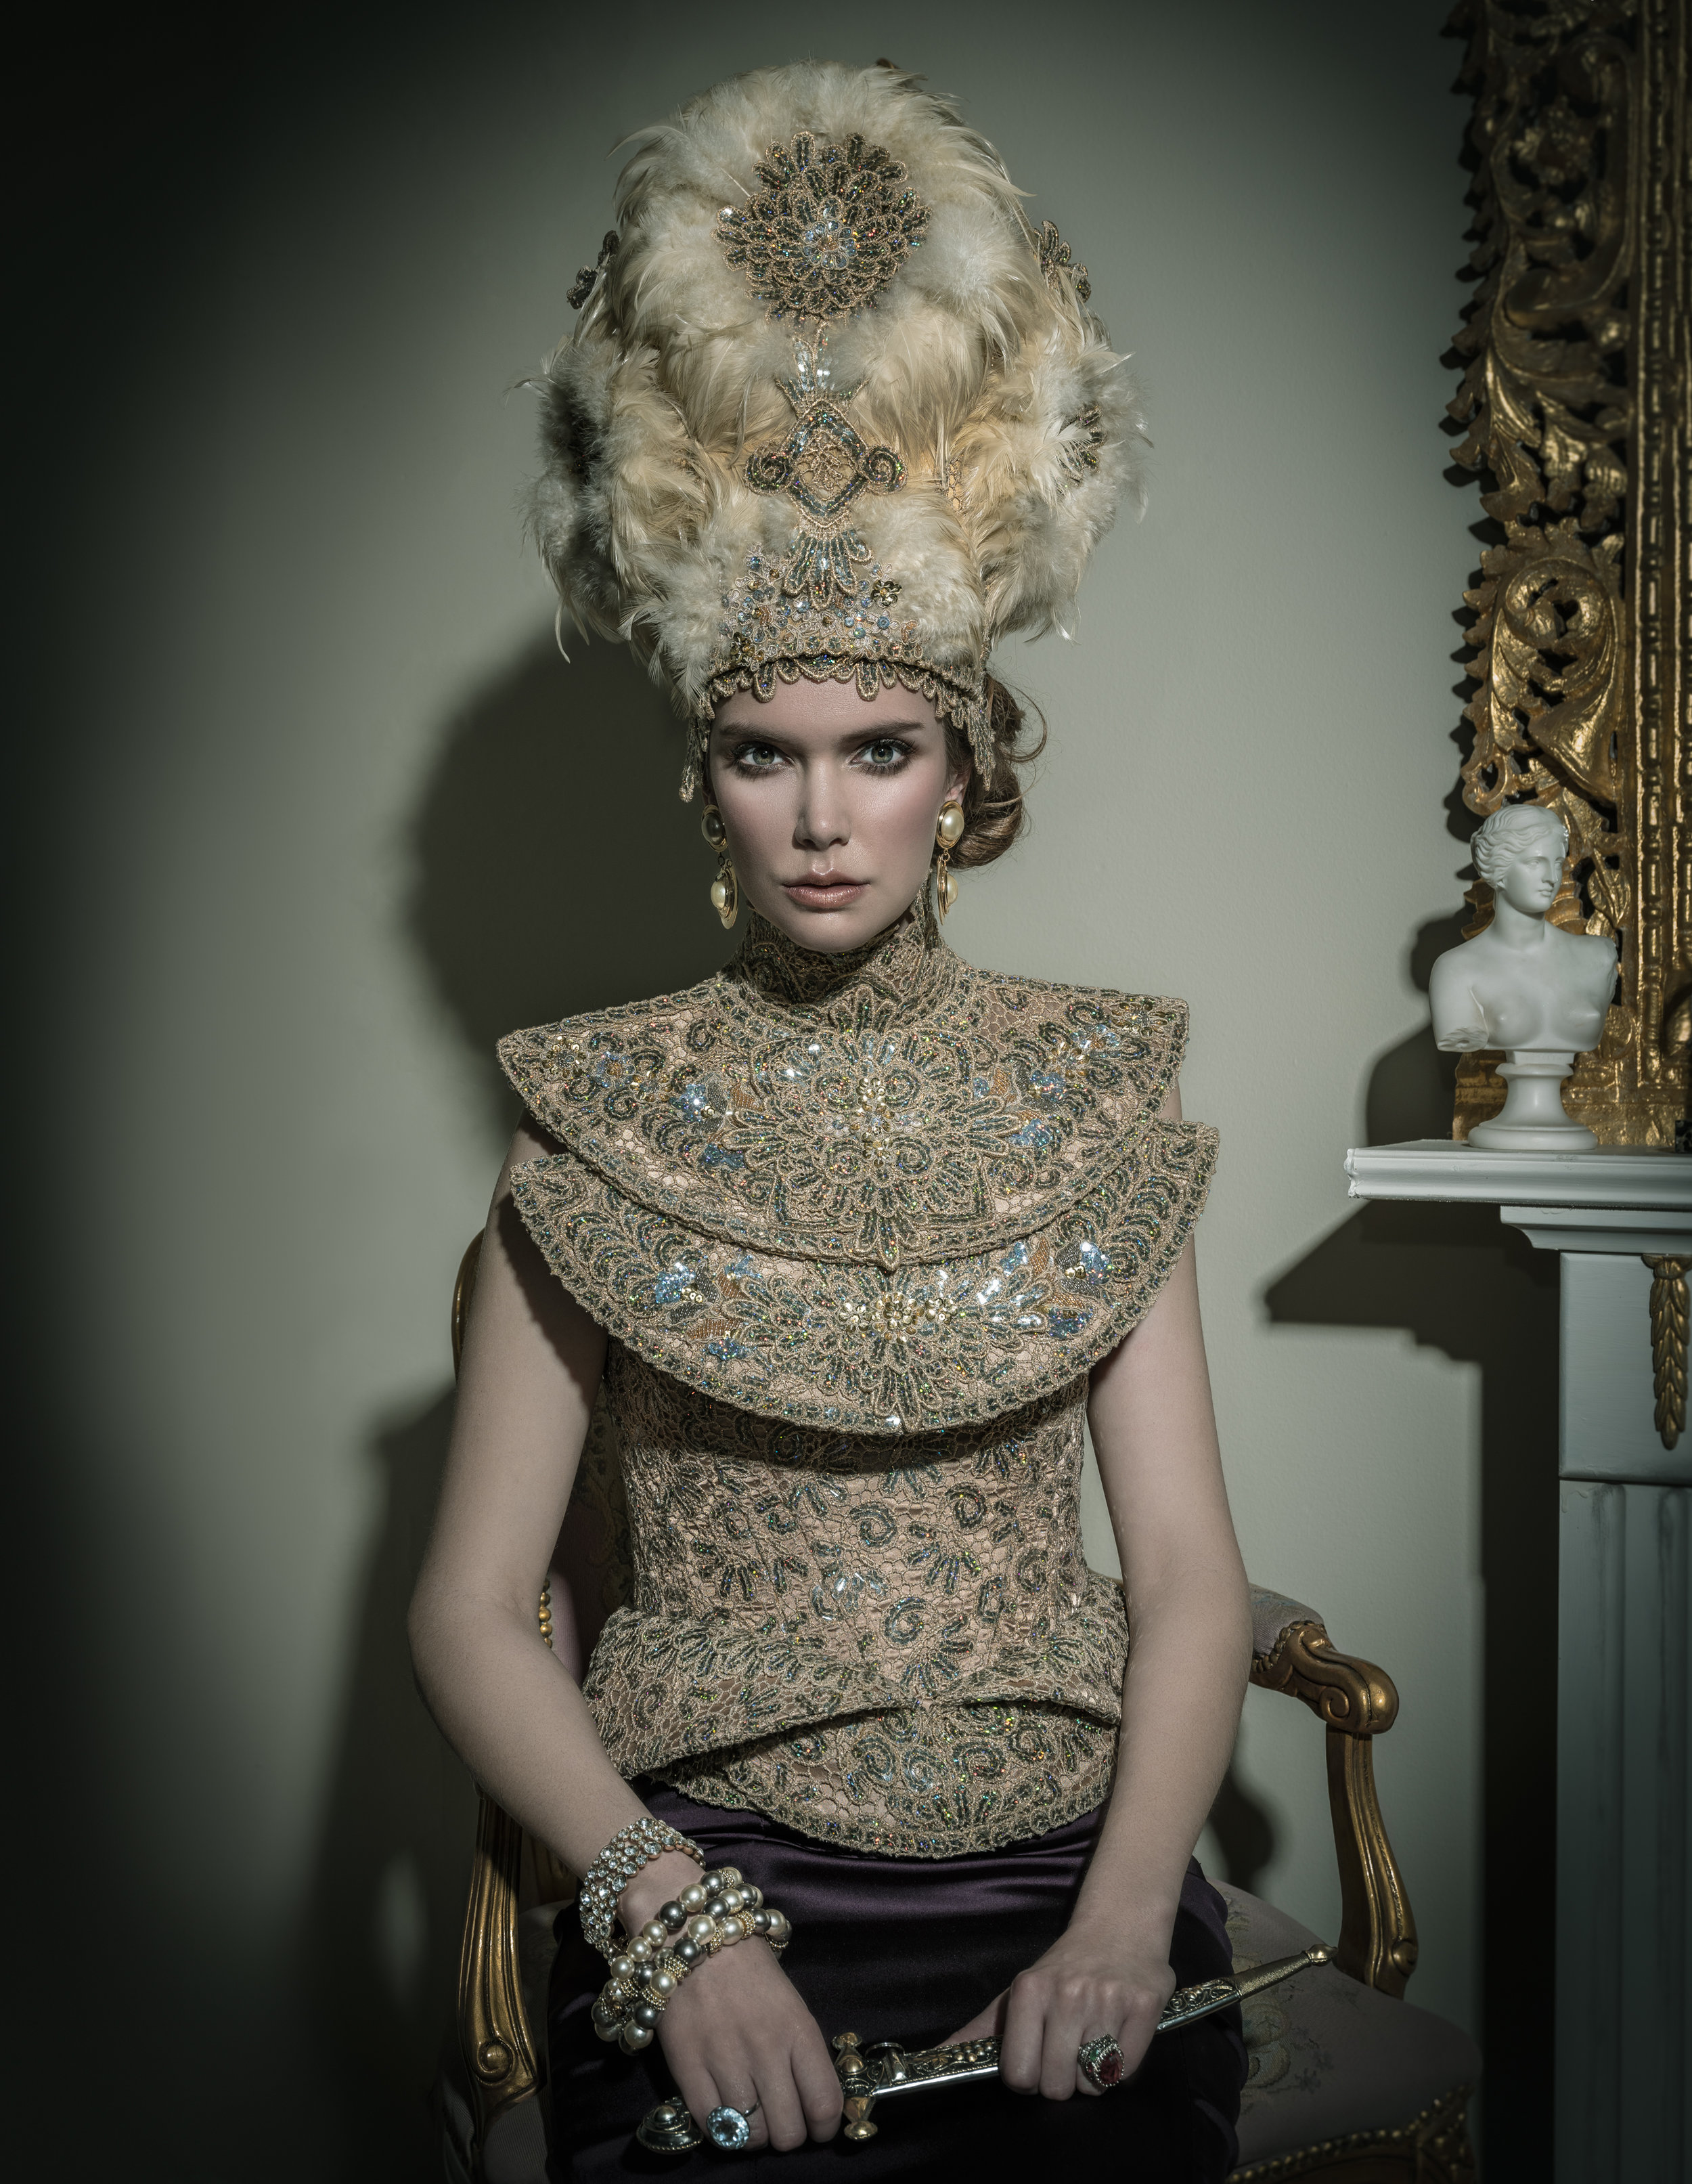 gown and headpiece: Marie Copps skirt: Terani jewellery: Penwarden,